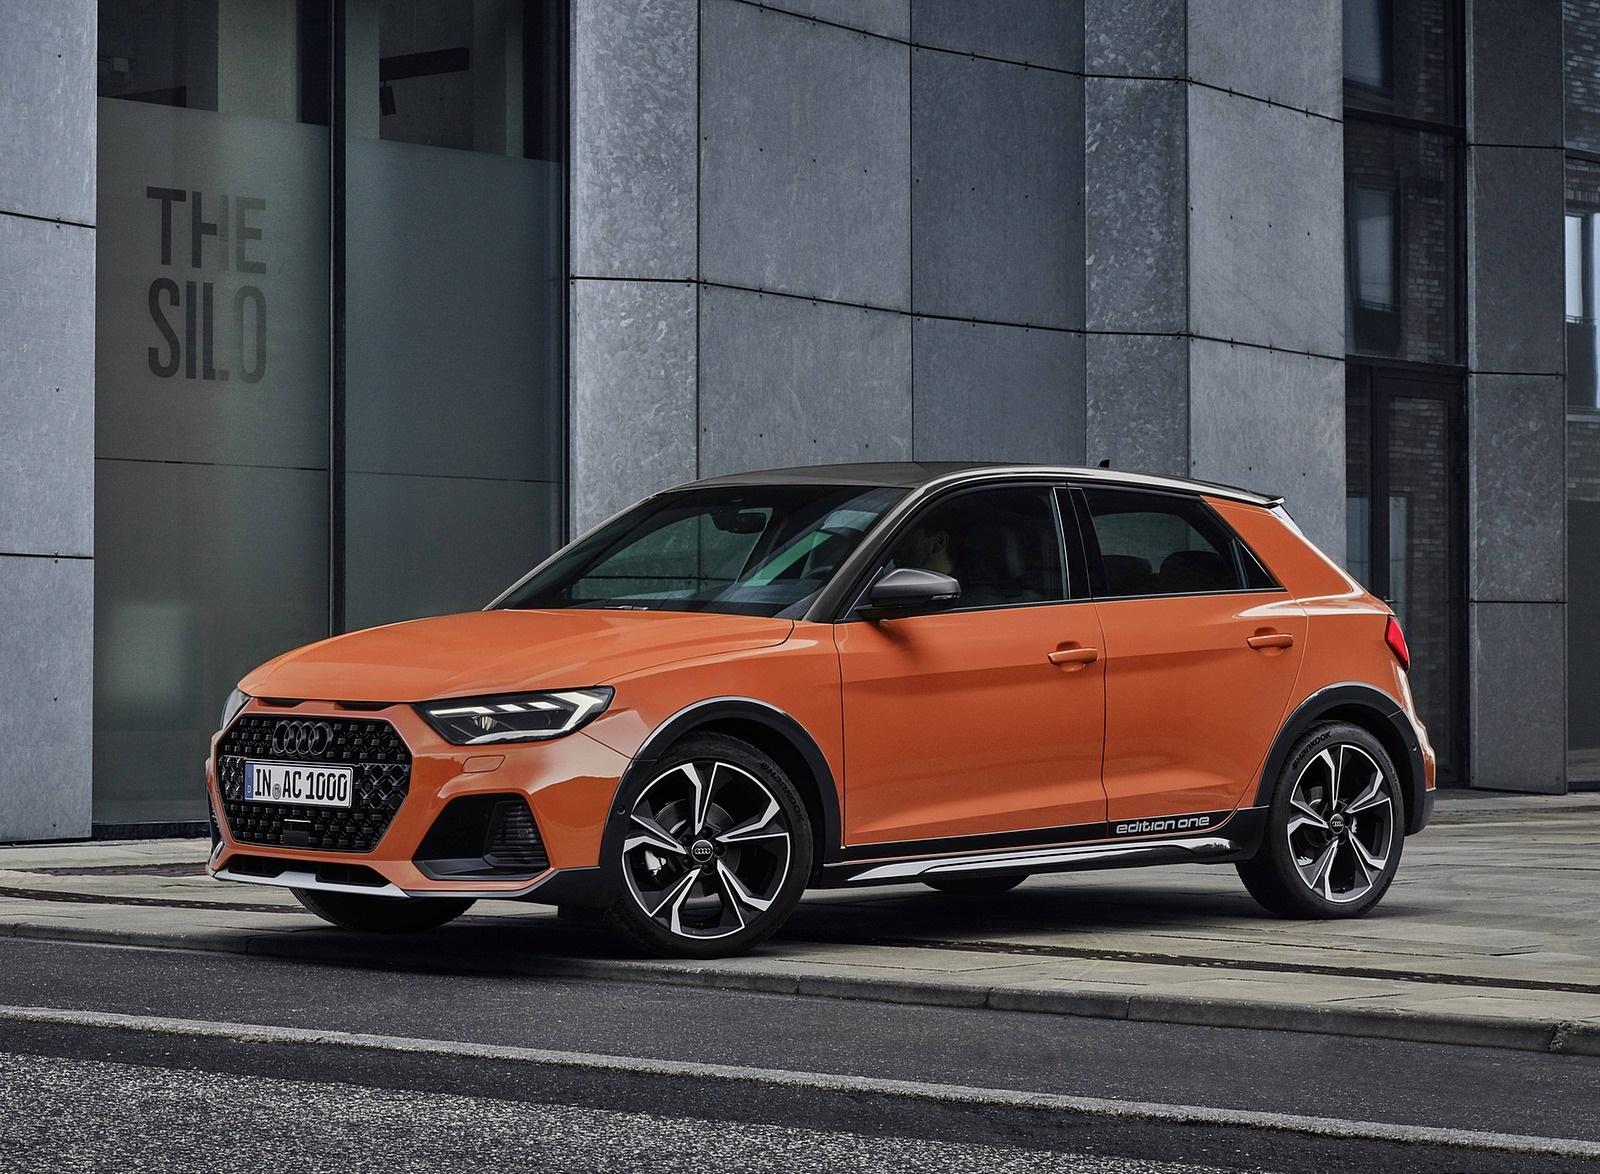 2020 Audi A1 Citycarver (Color: Pulse Orange) Front Three-Quarter Wallpapers (12)